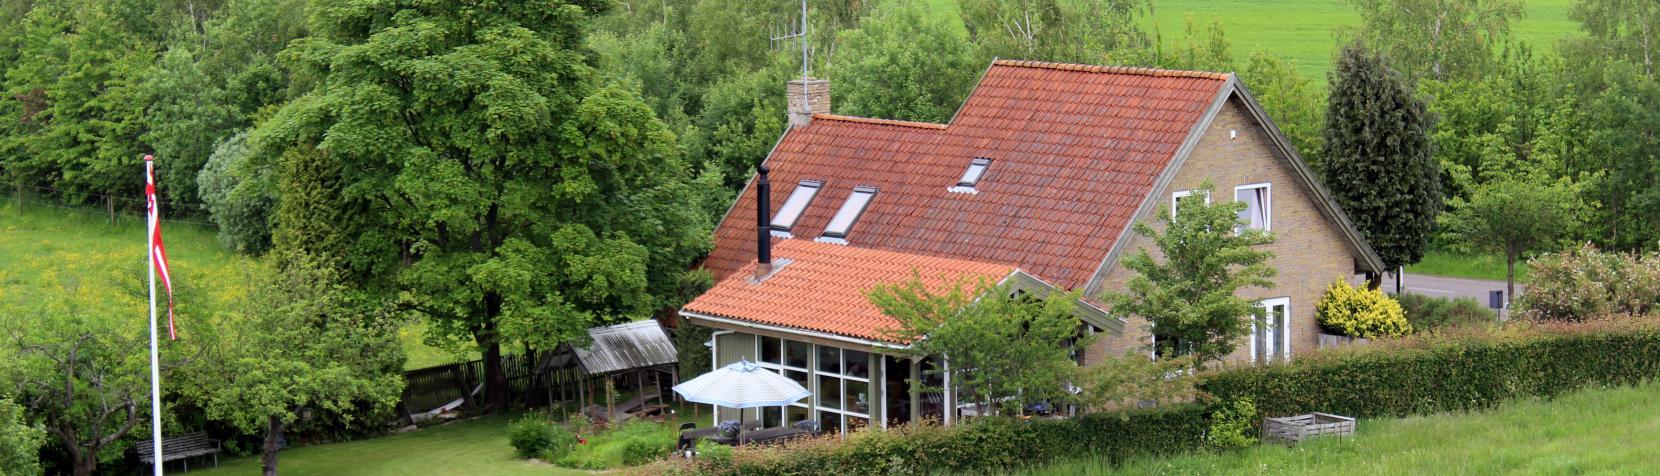 Hus med grønne marker